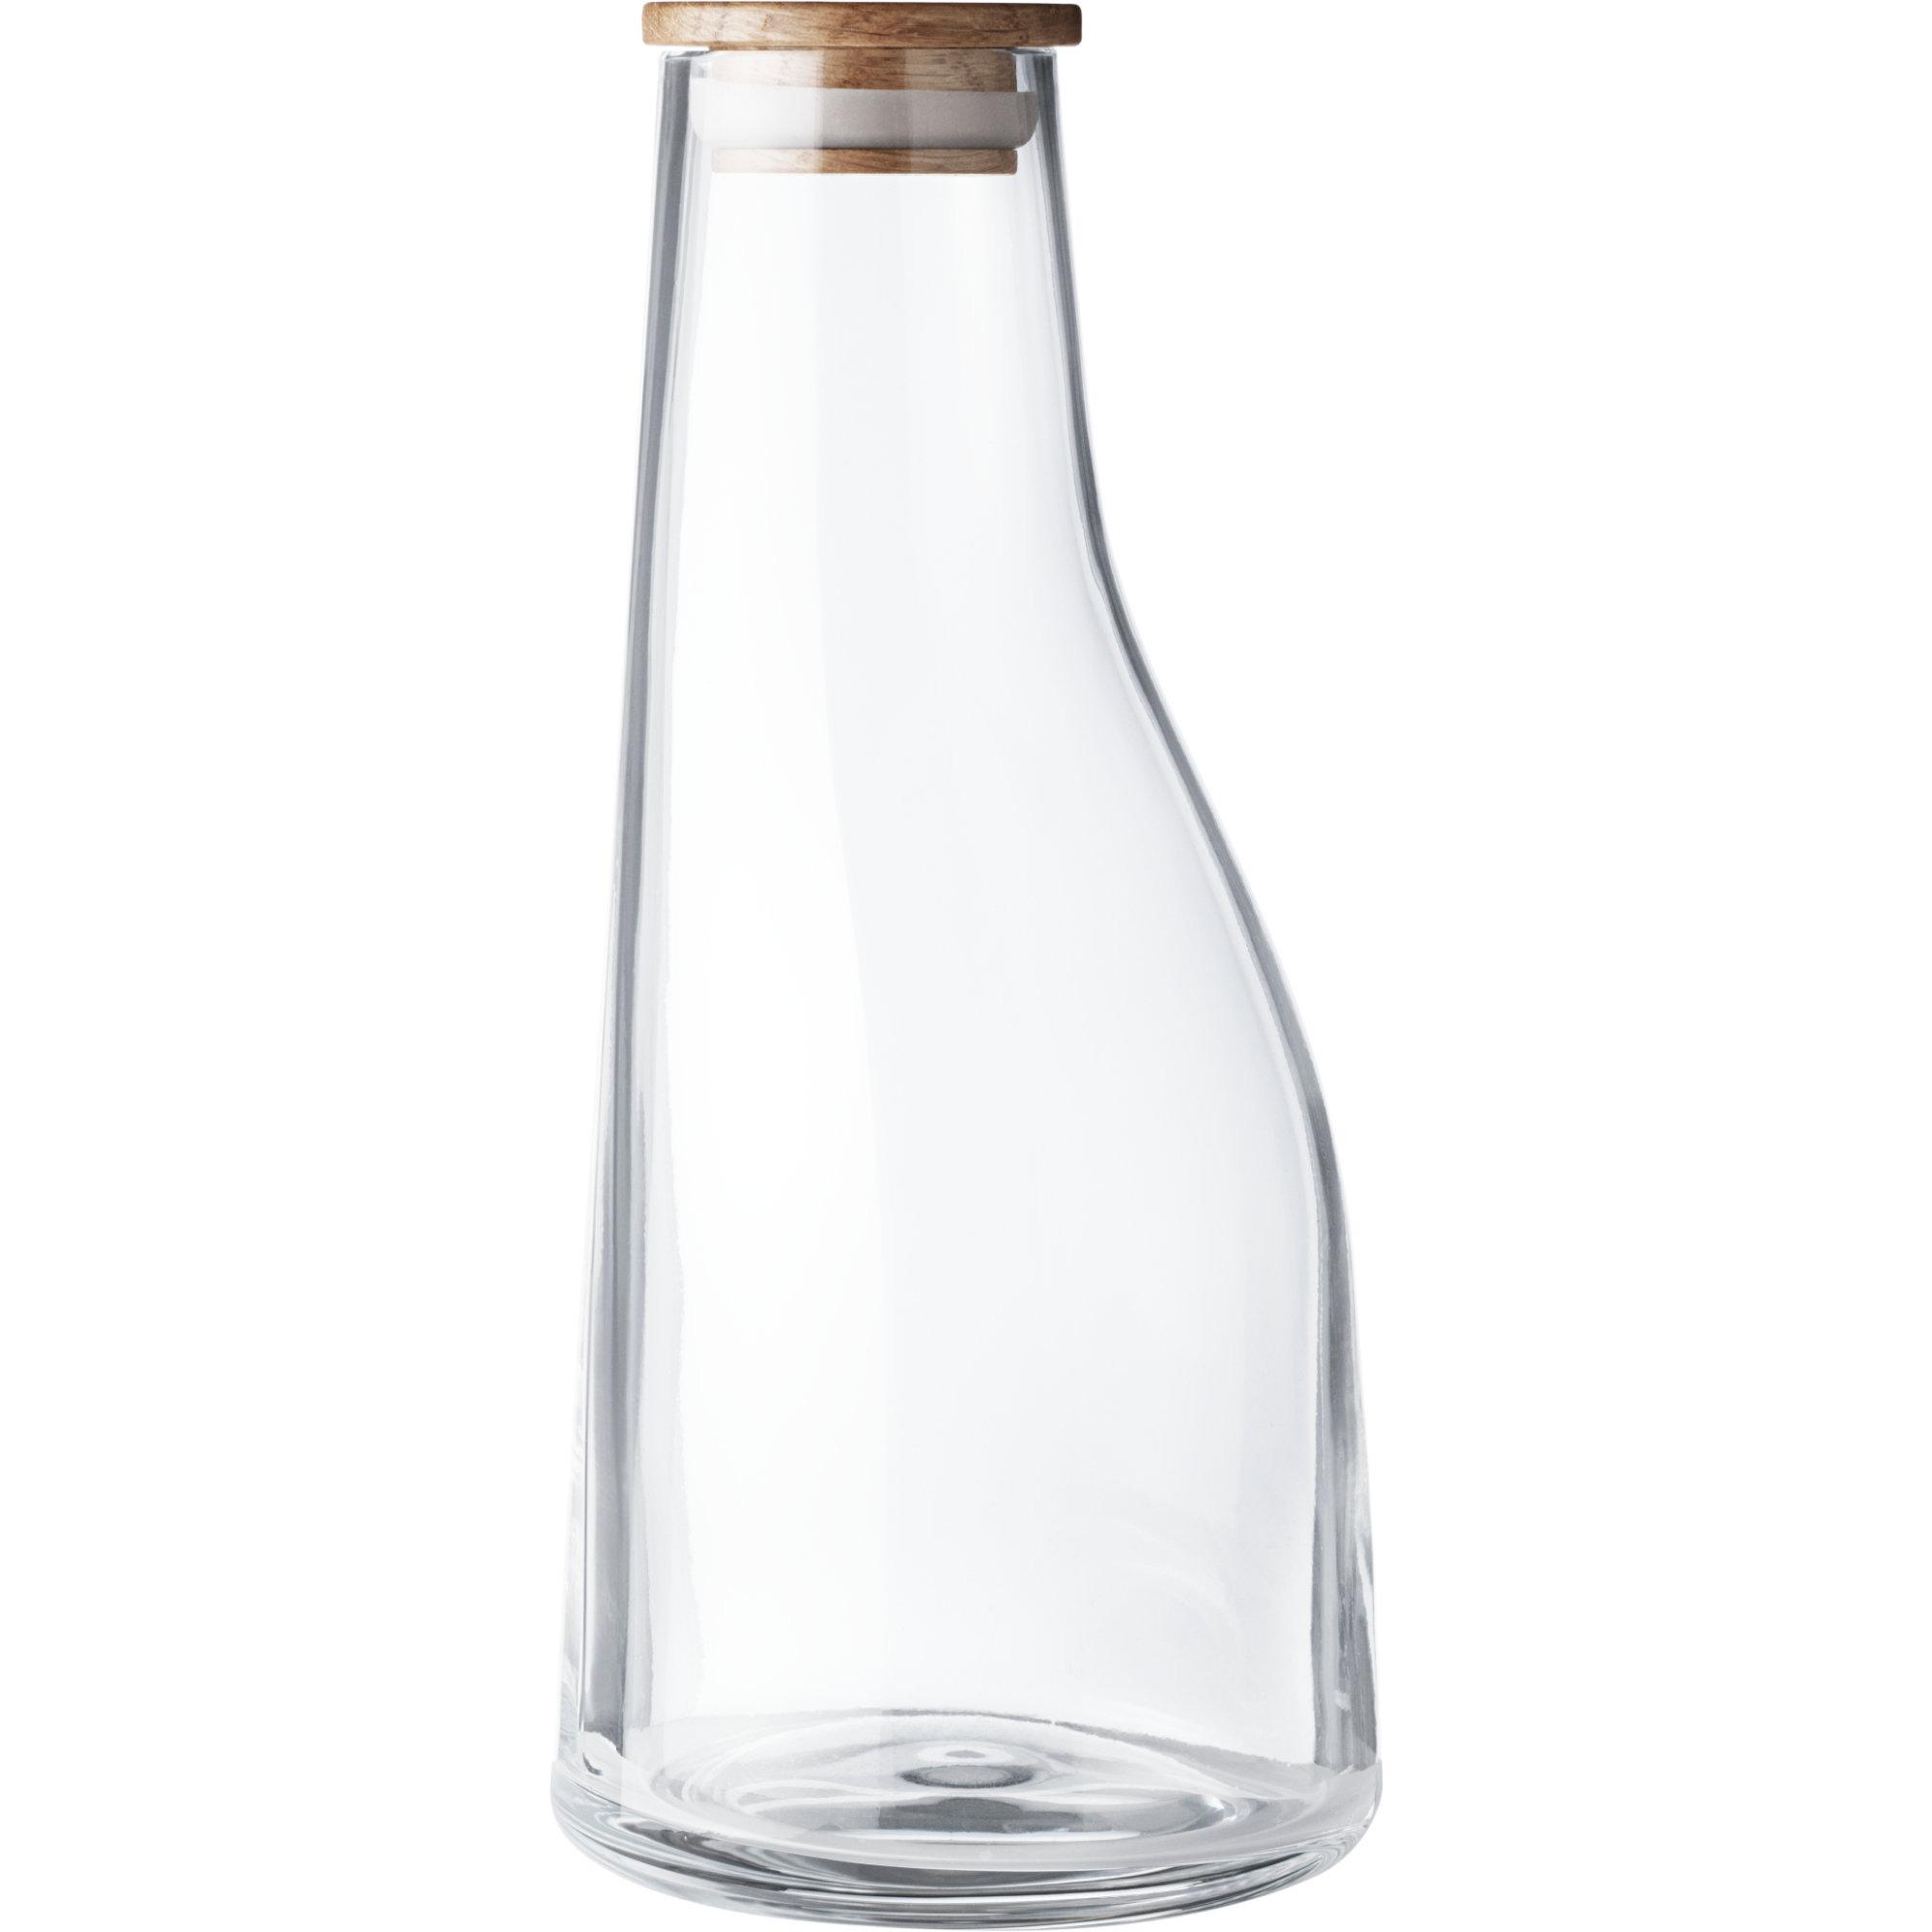 Georg Jensen Barbry Glaskaraff 05 Liter